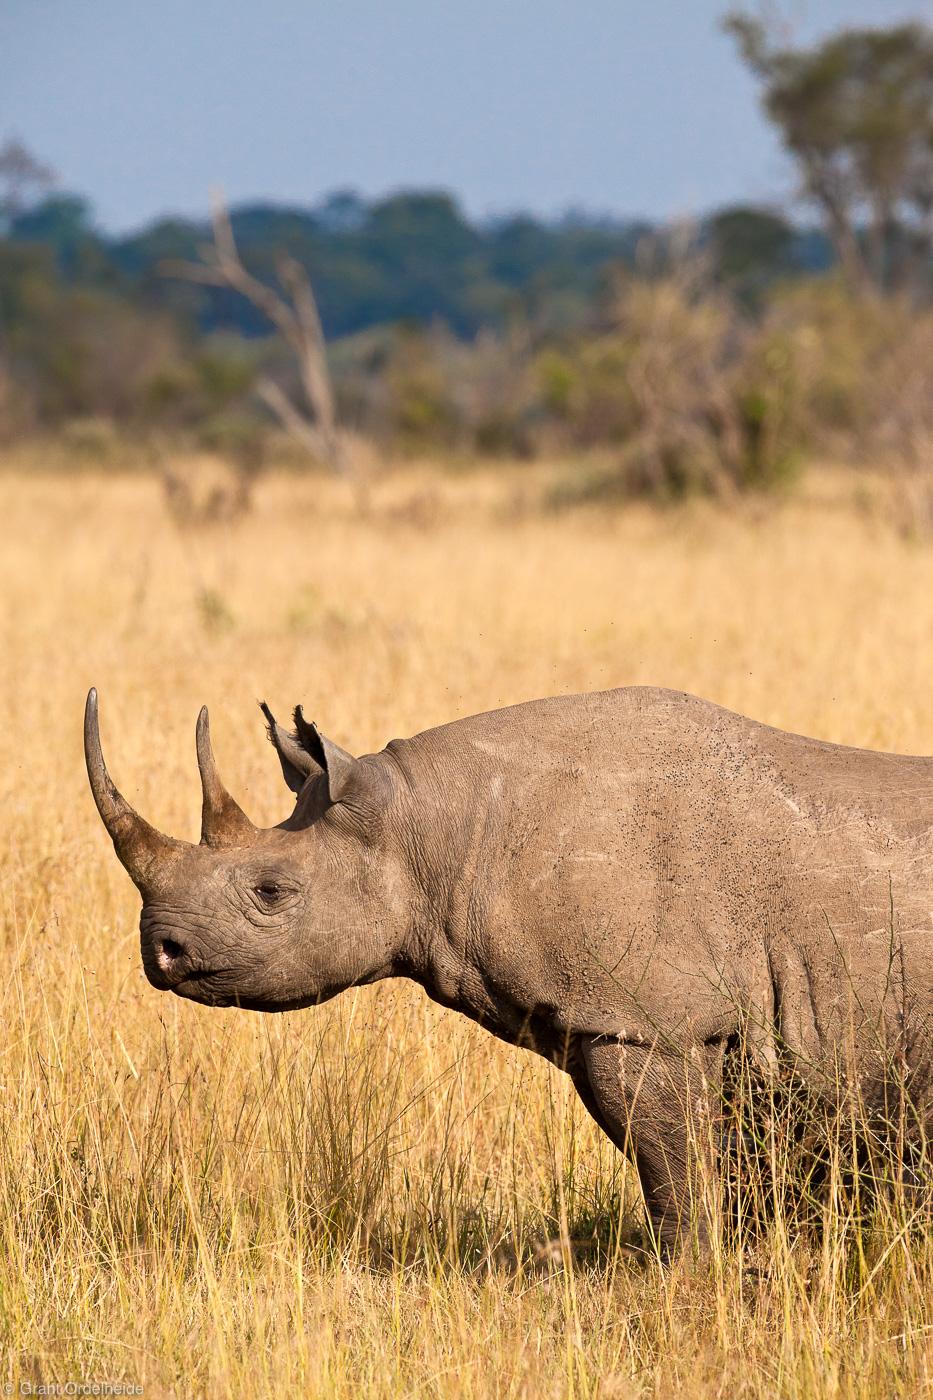 black, horned, rhino, rhinoceros, pose, classic, masai, mara, kenya, africa, photo